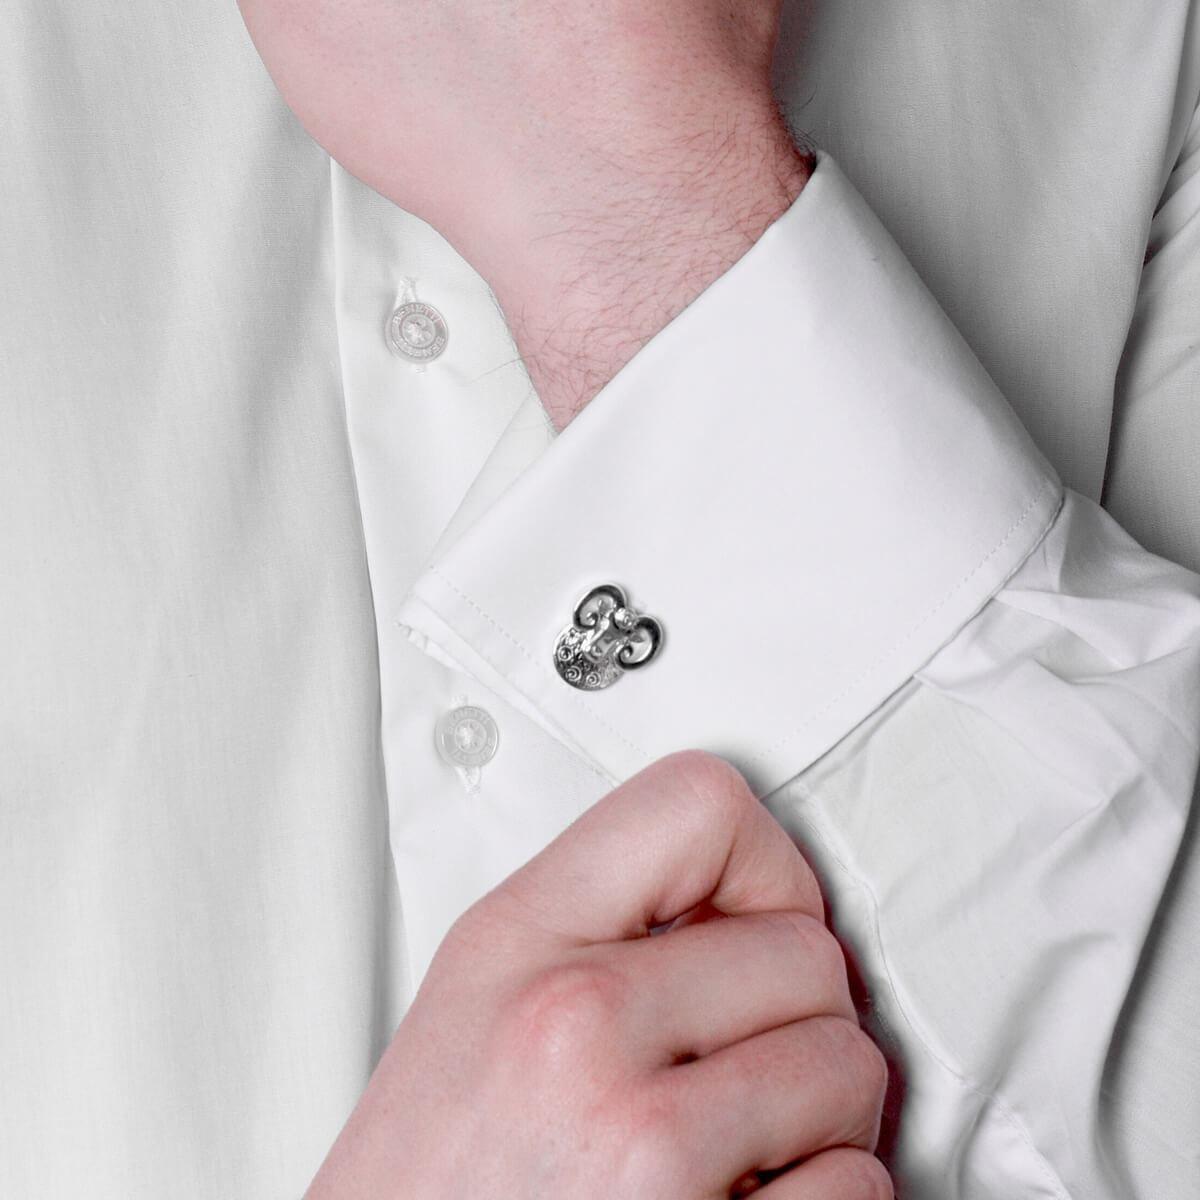 Sterling Silver Aries Ram Cufflinks, Saba Jewellery